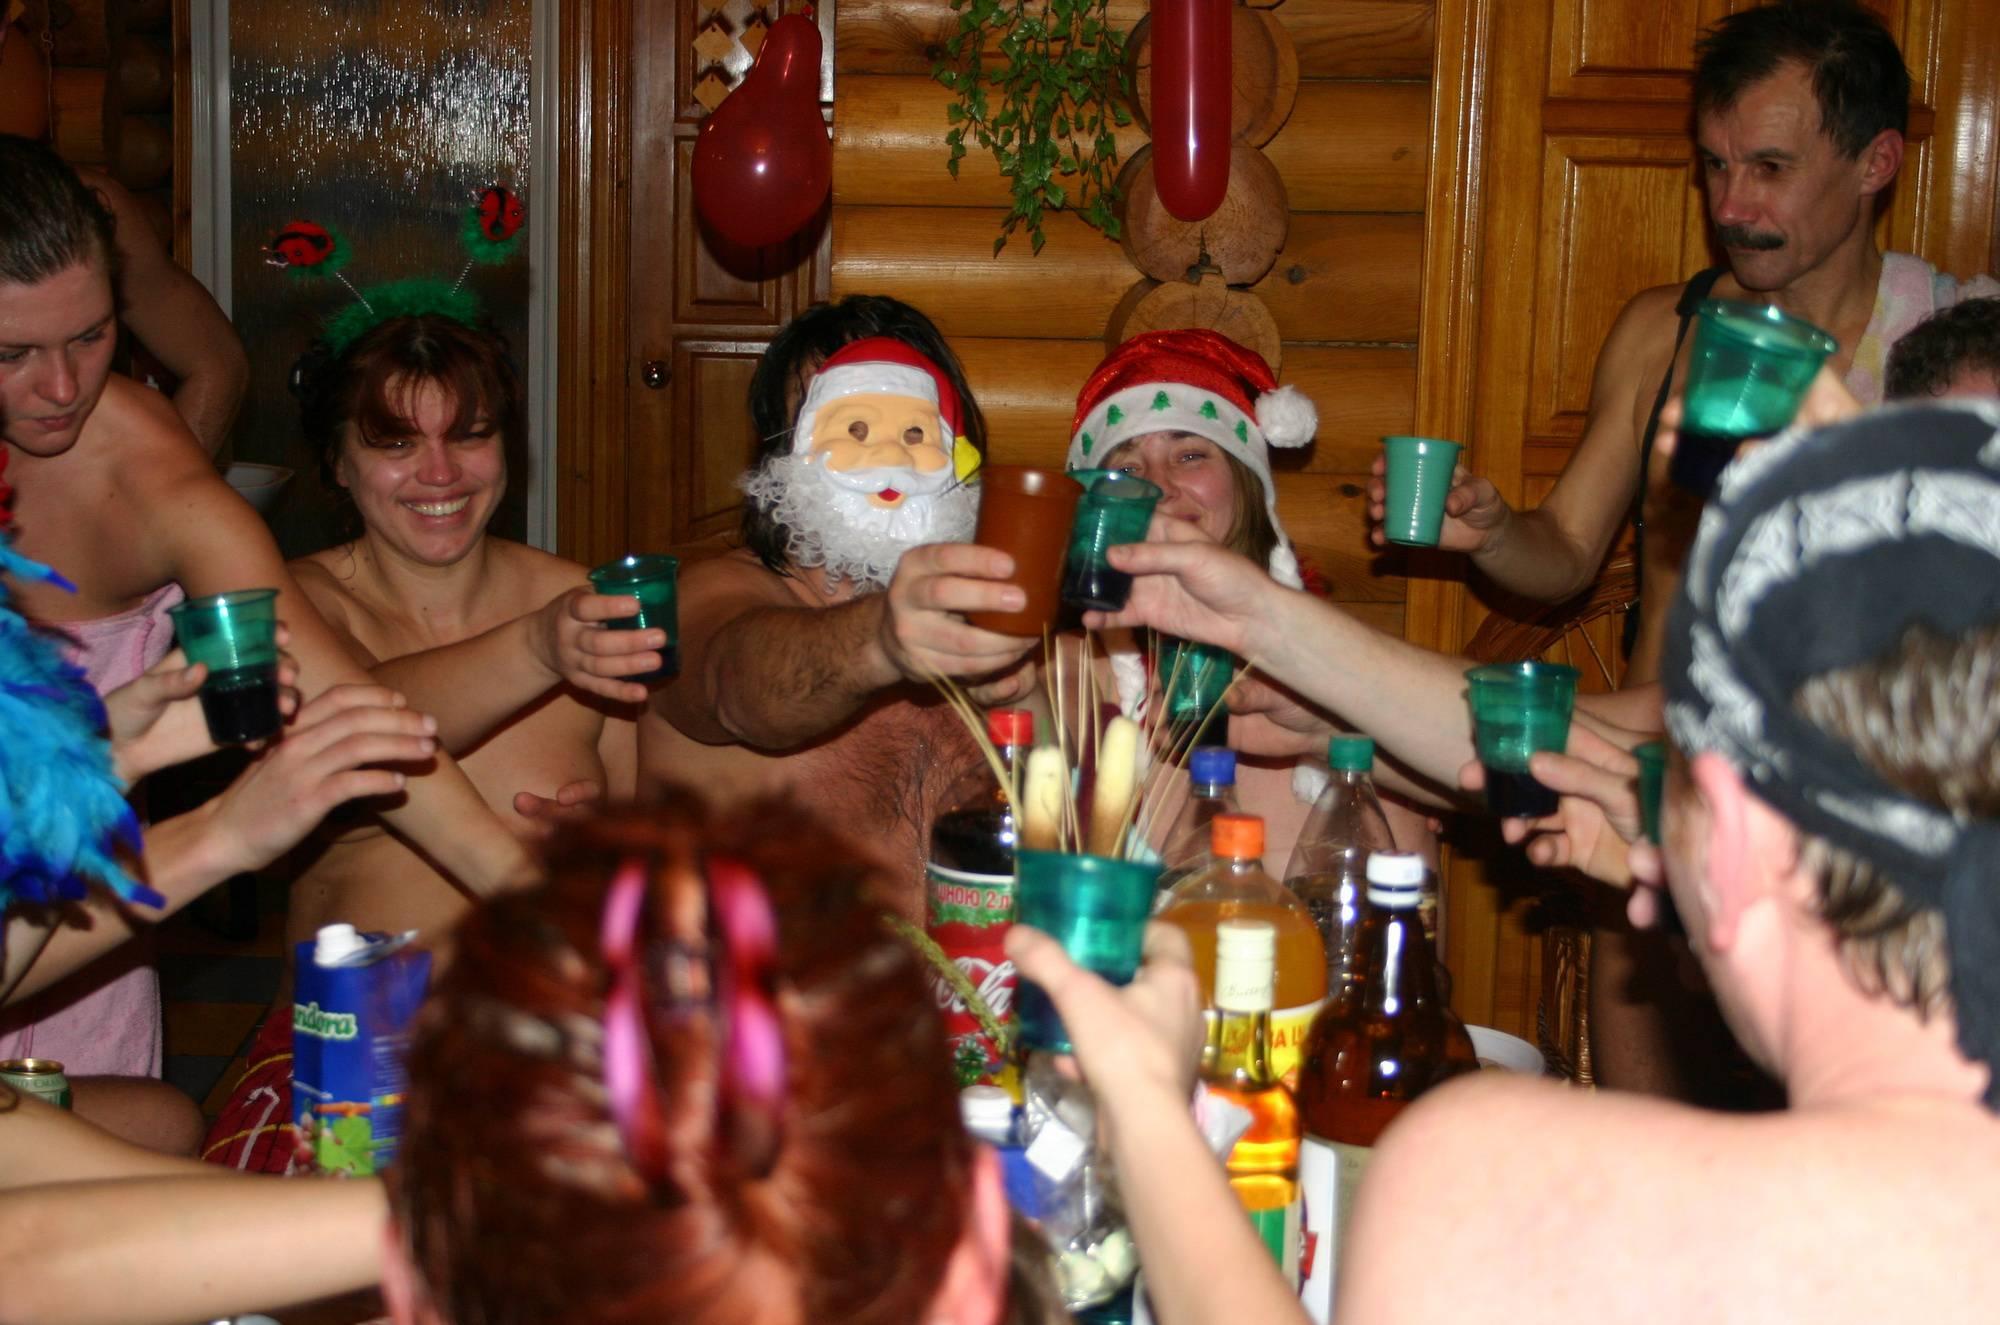 Nudist Gallery Kiev Masquerade Dining - 1